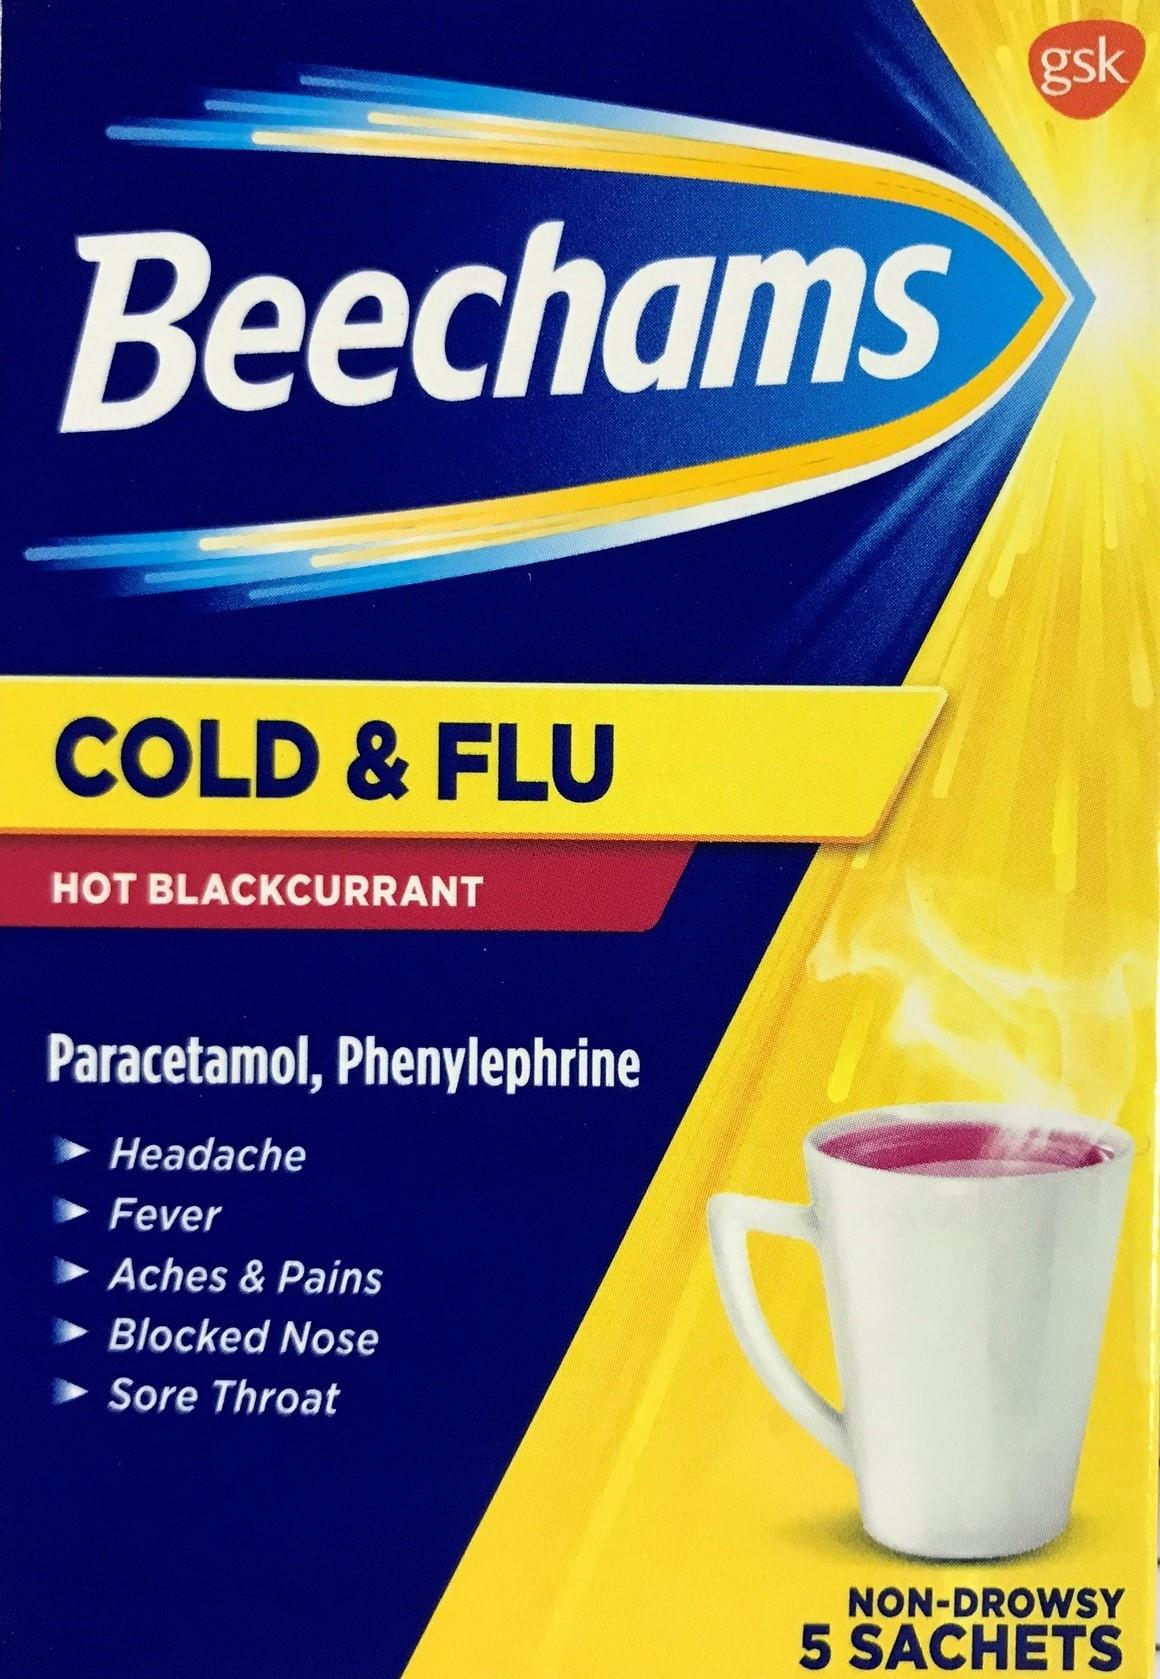 Beechams Blackcurrant